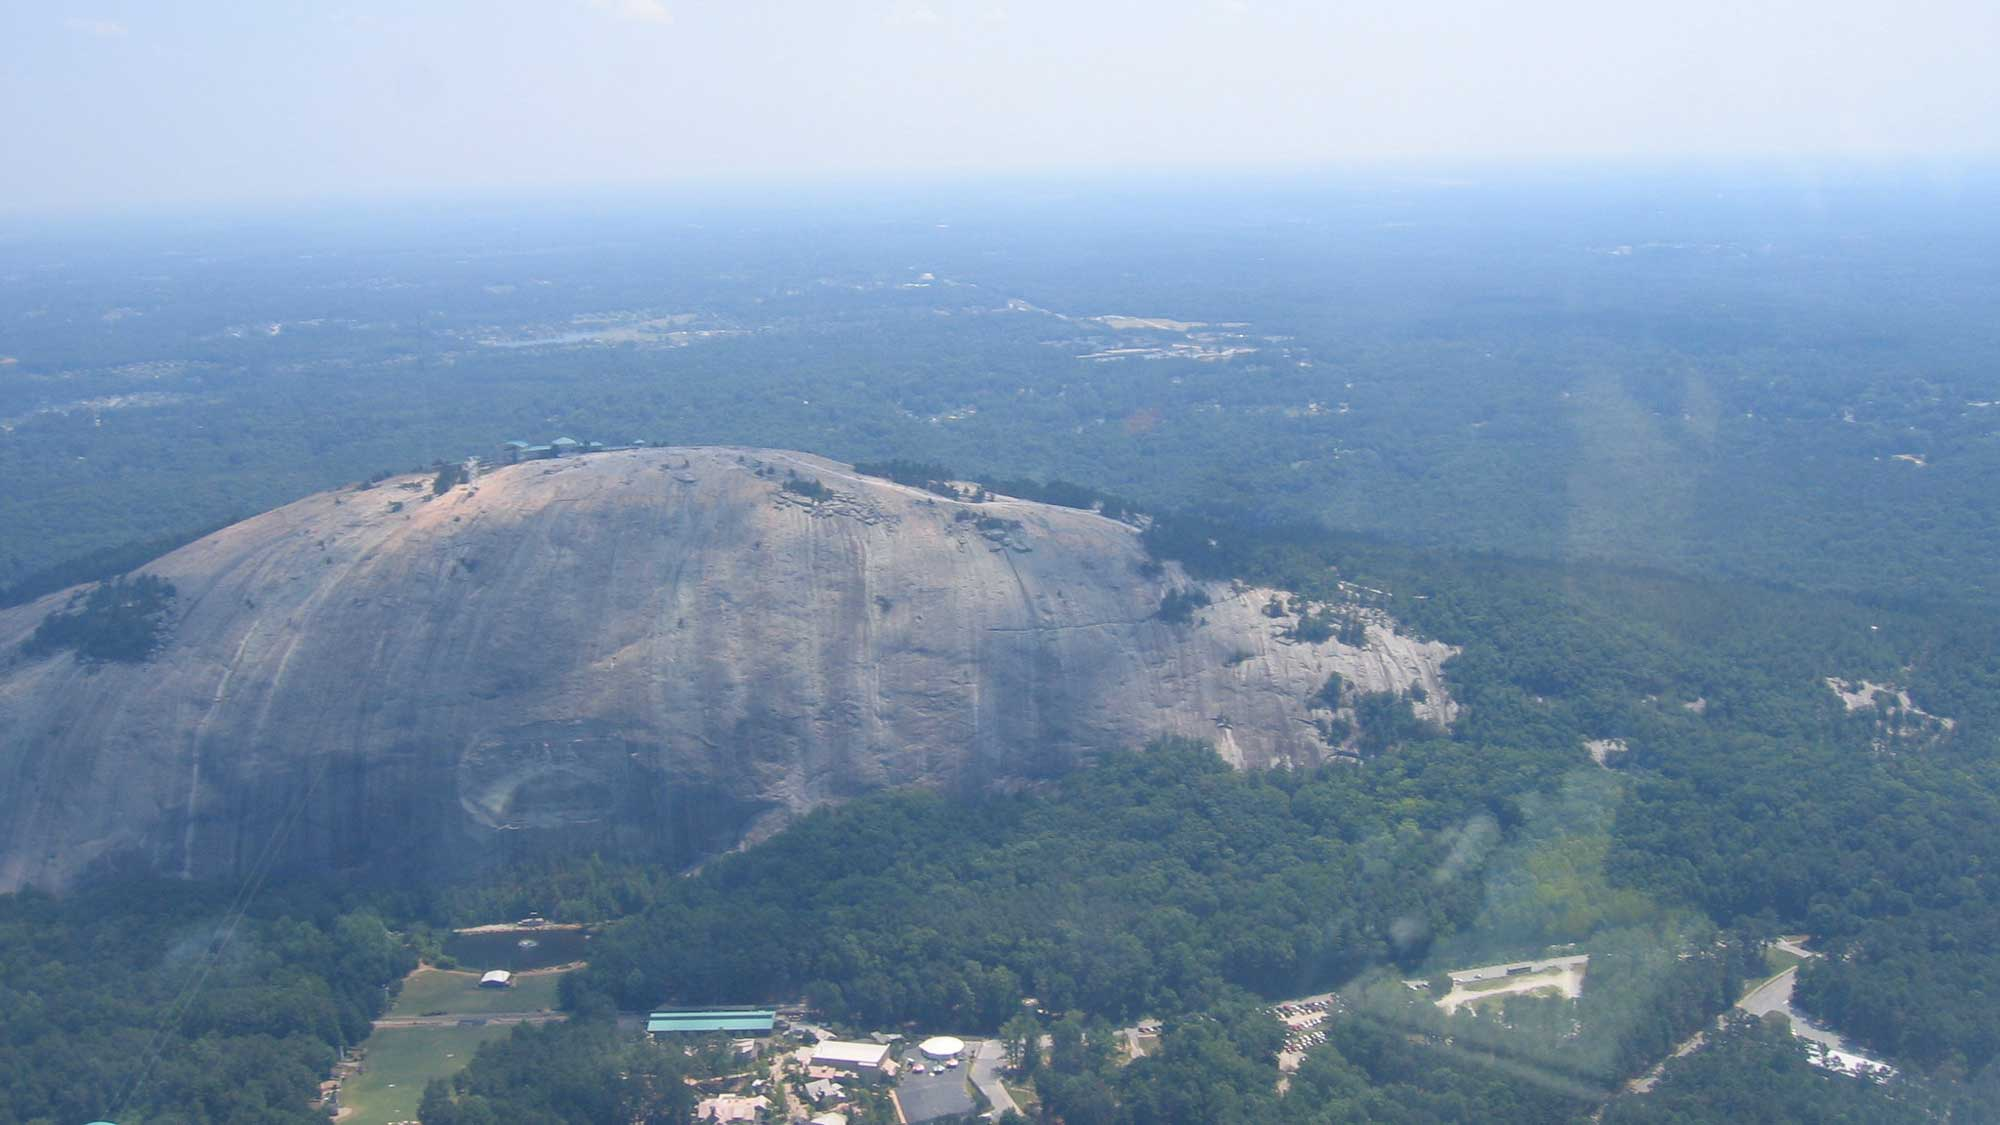 Aerial photograph of Stone Mountain, Georgia.